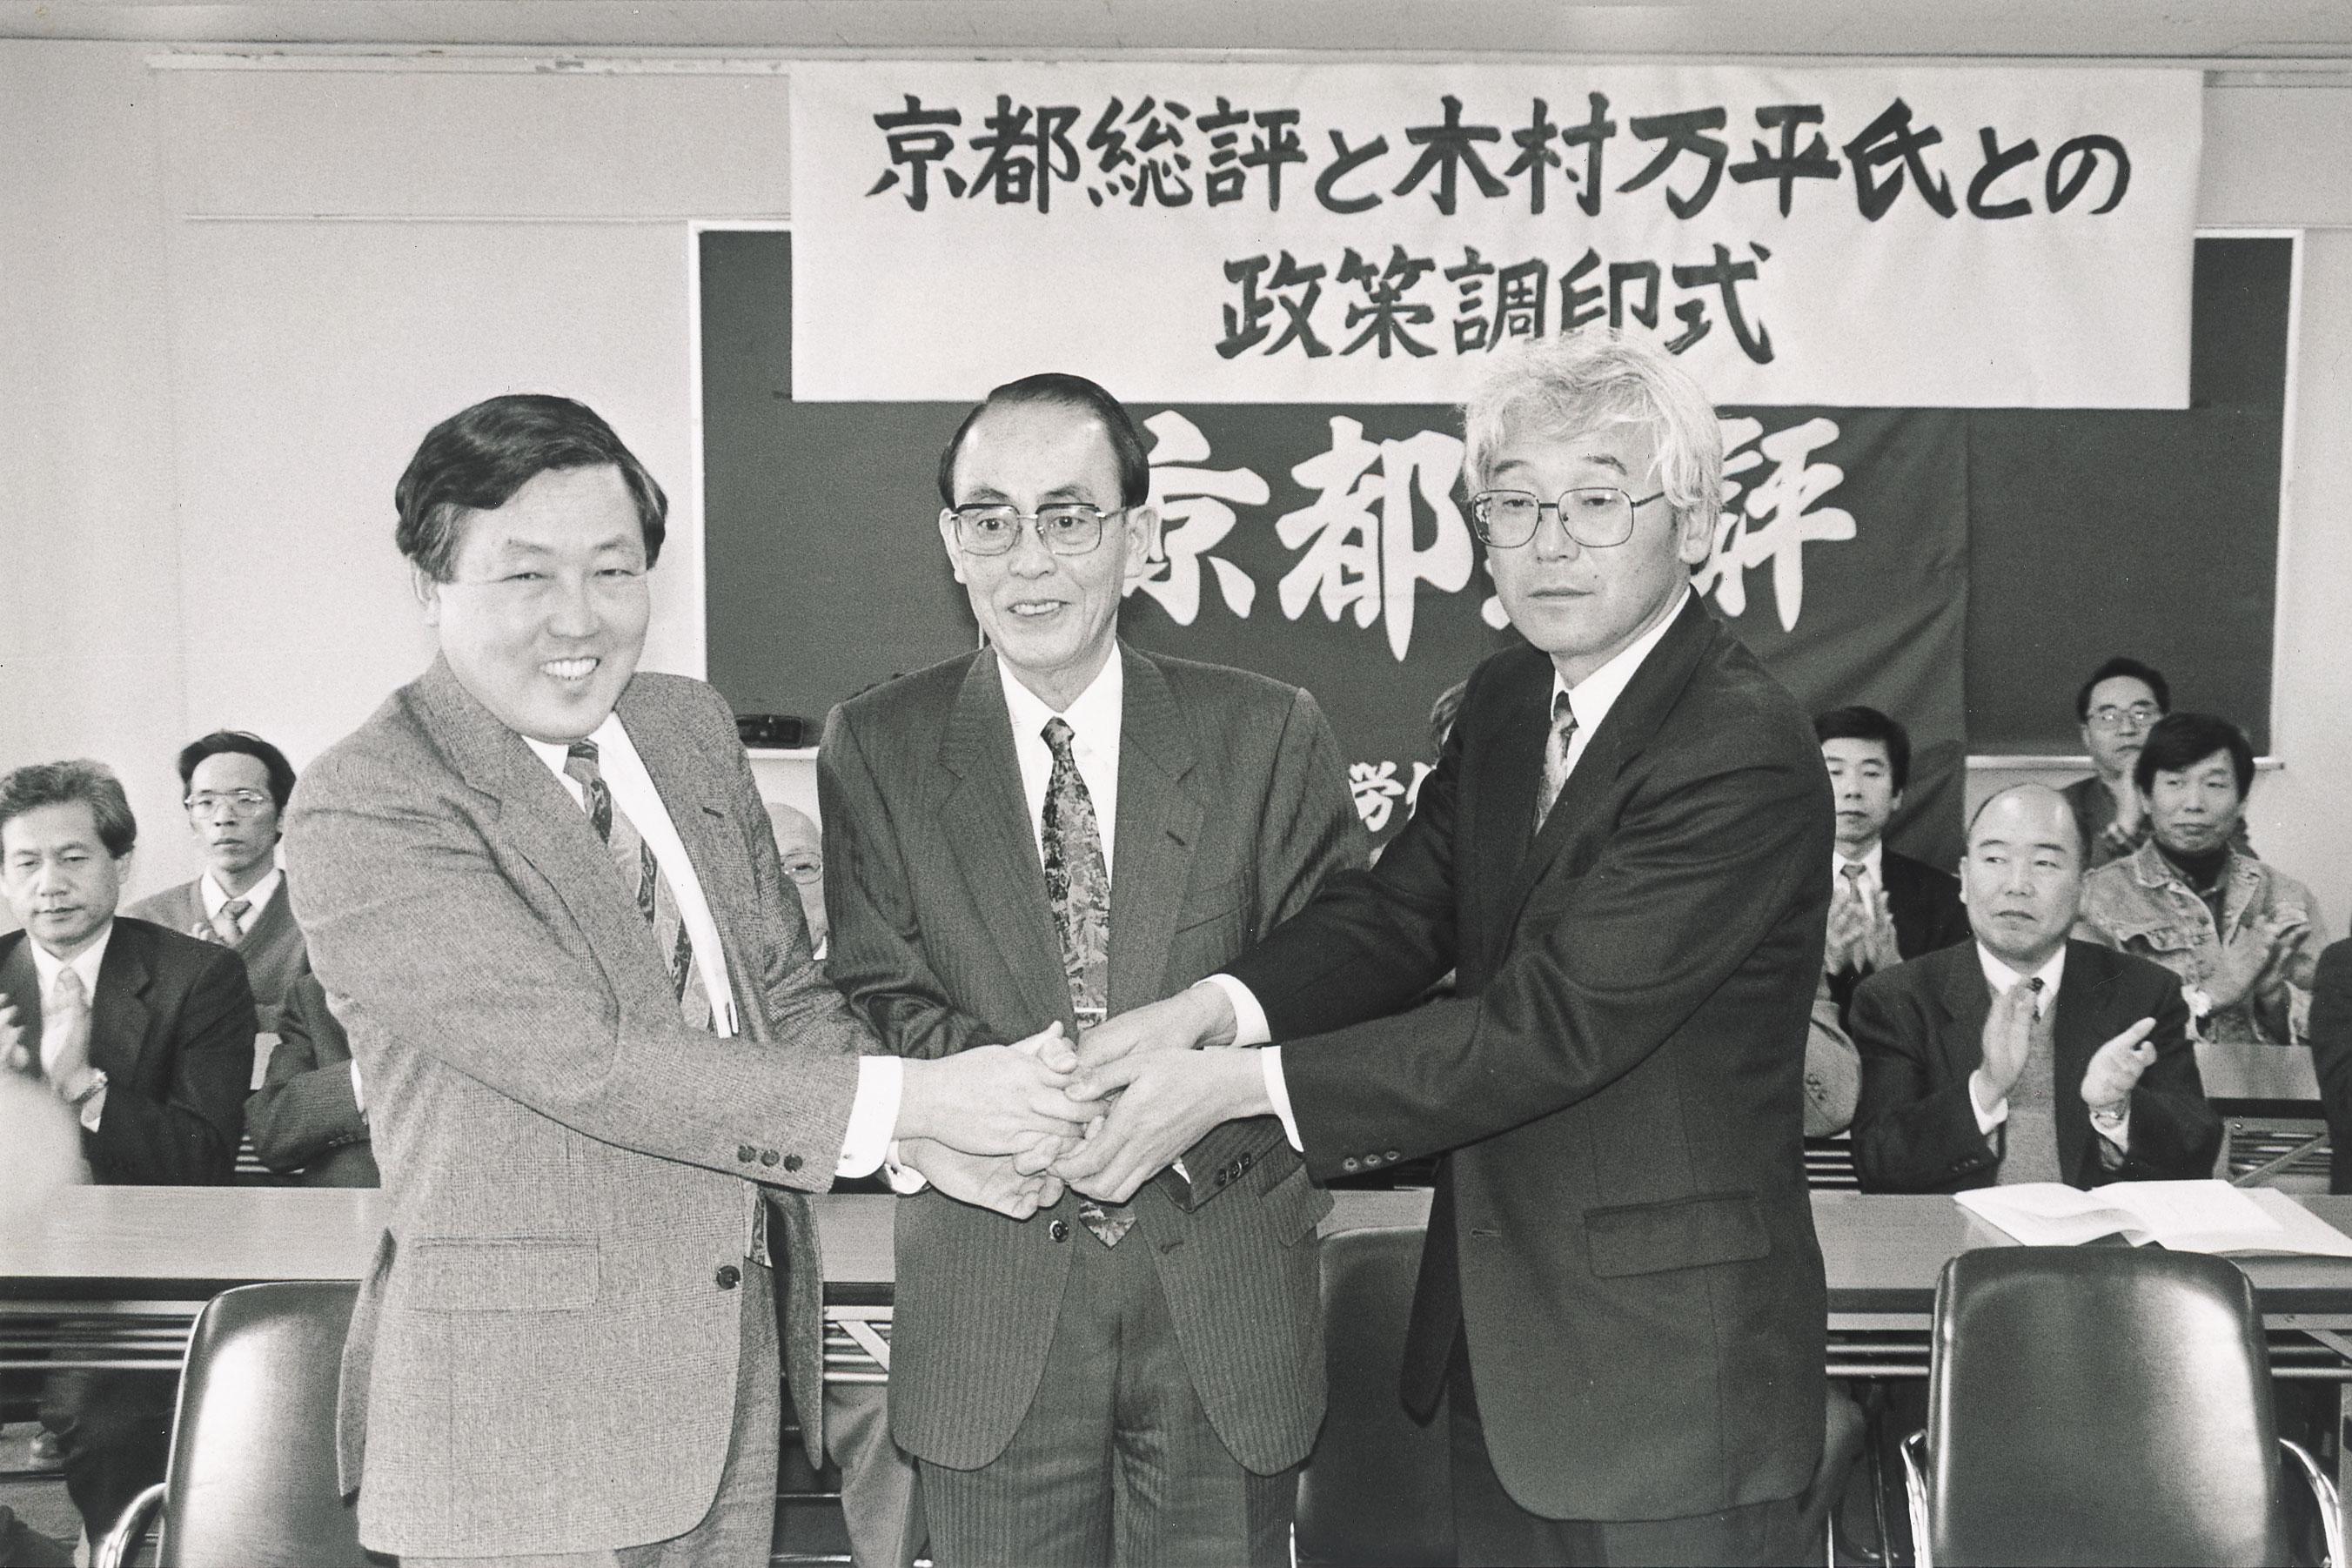 京都総評と木村万平氏との政策調印式